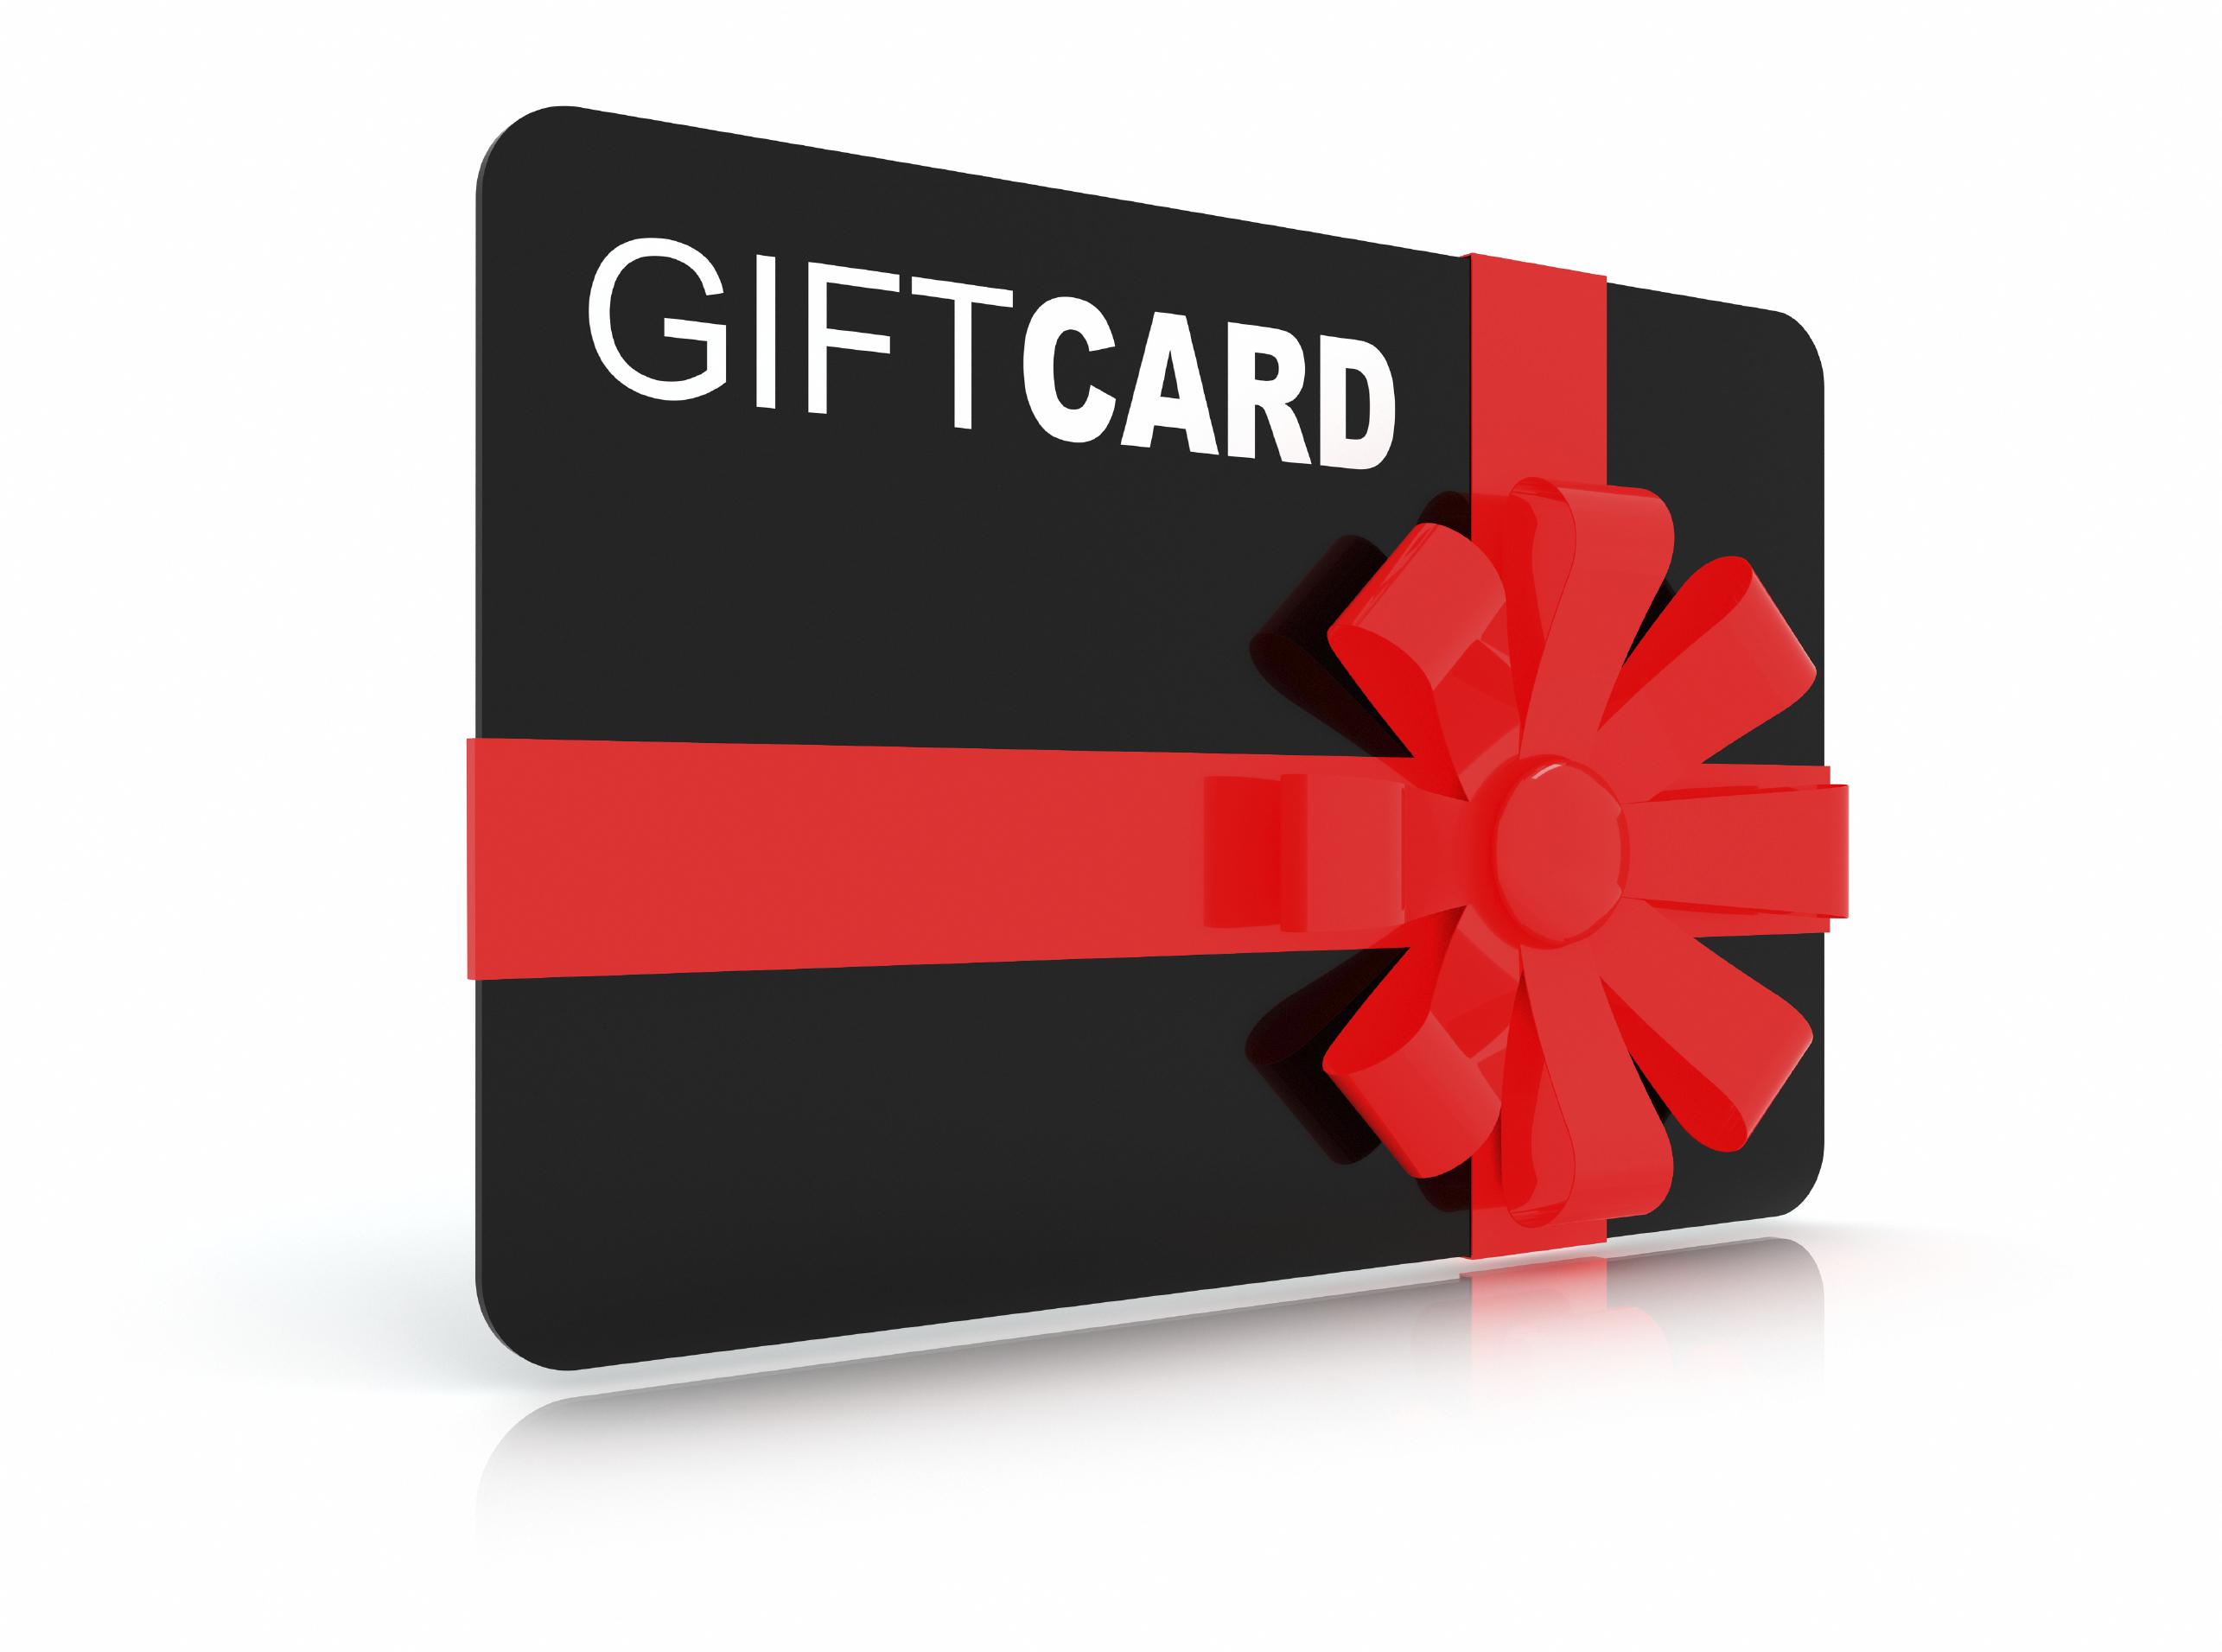 Ikebana Gift Card - $100.00 Image